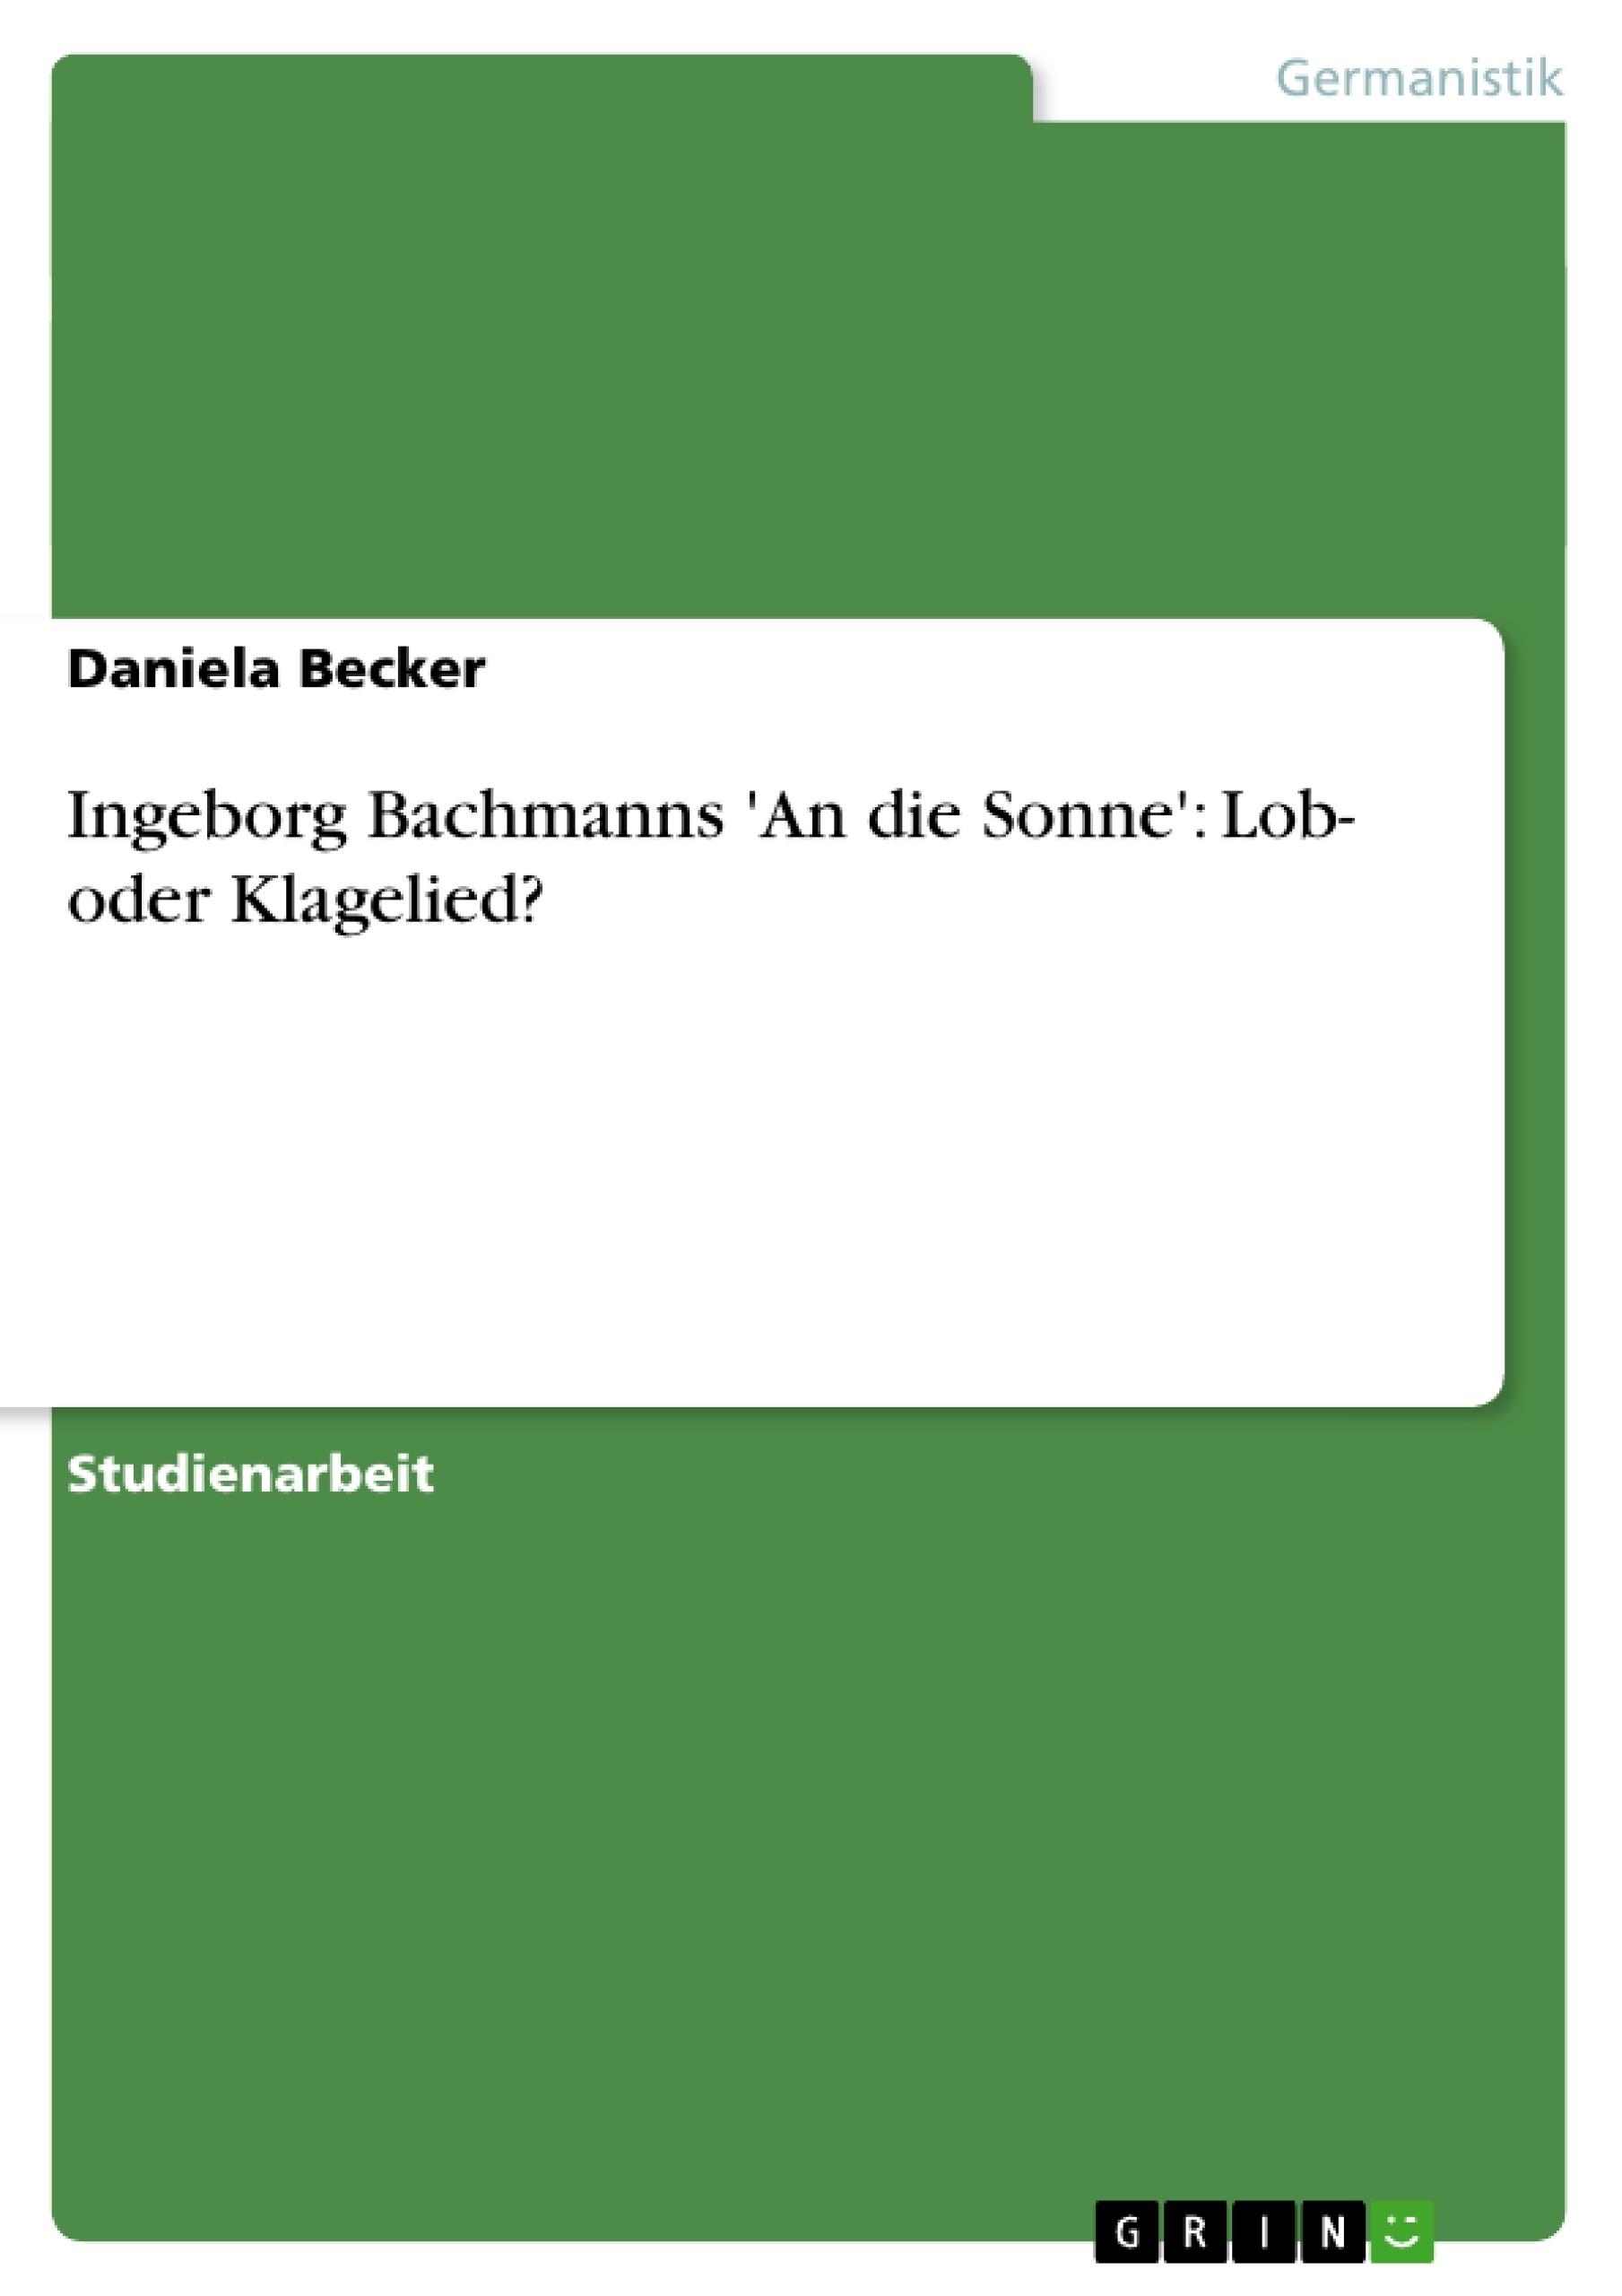 Titel: Ingeborg Bachmanns 'An die Sonne': Lob- oder Klagelied?